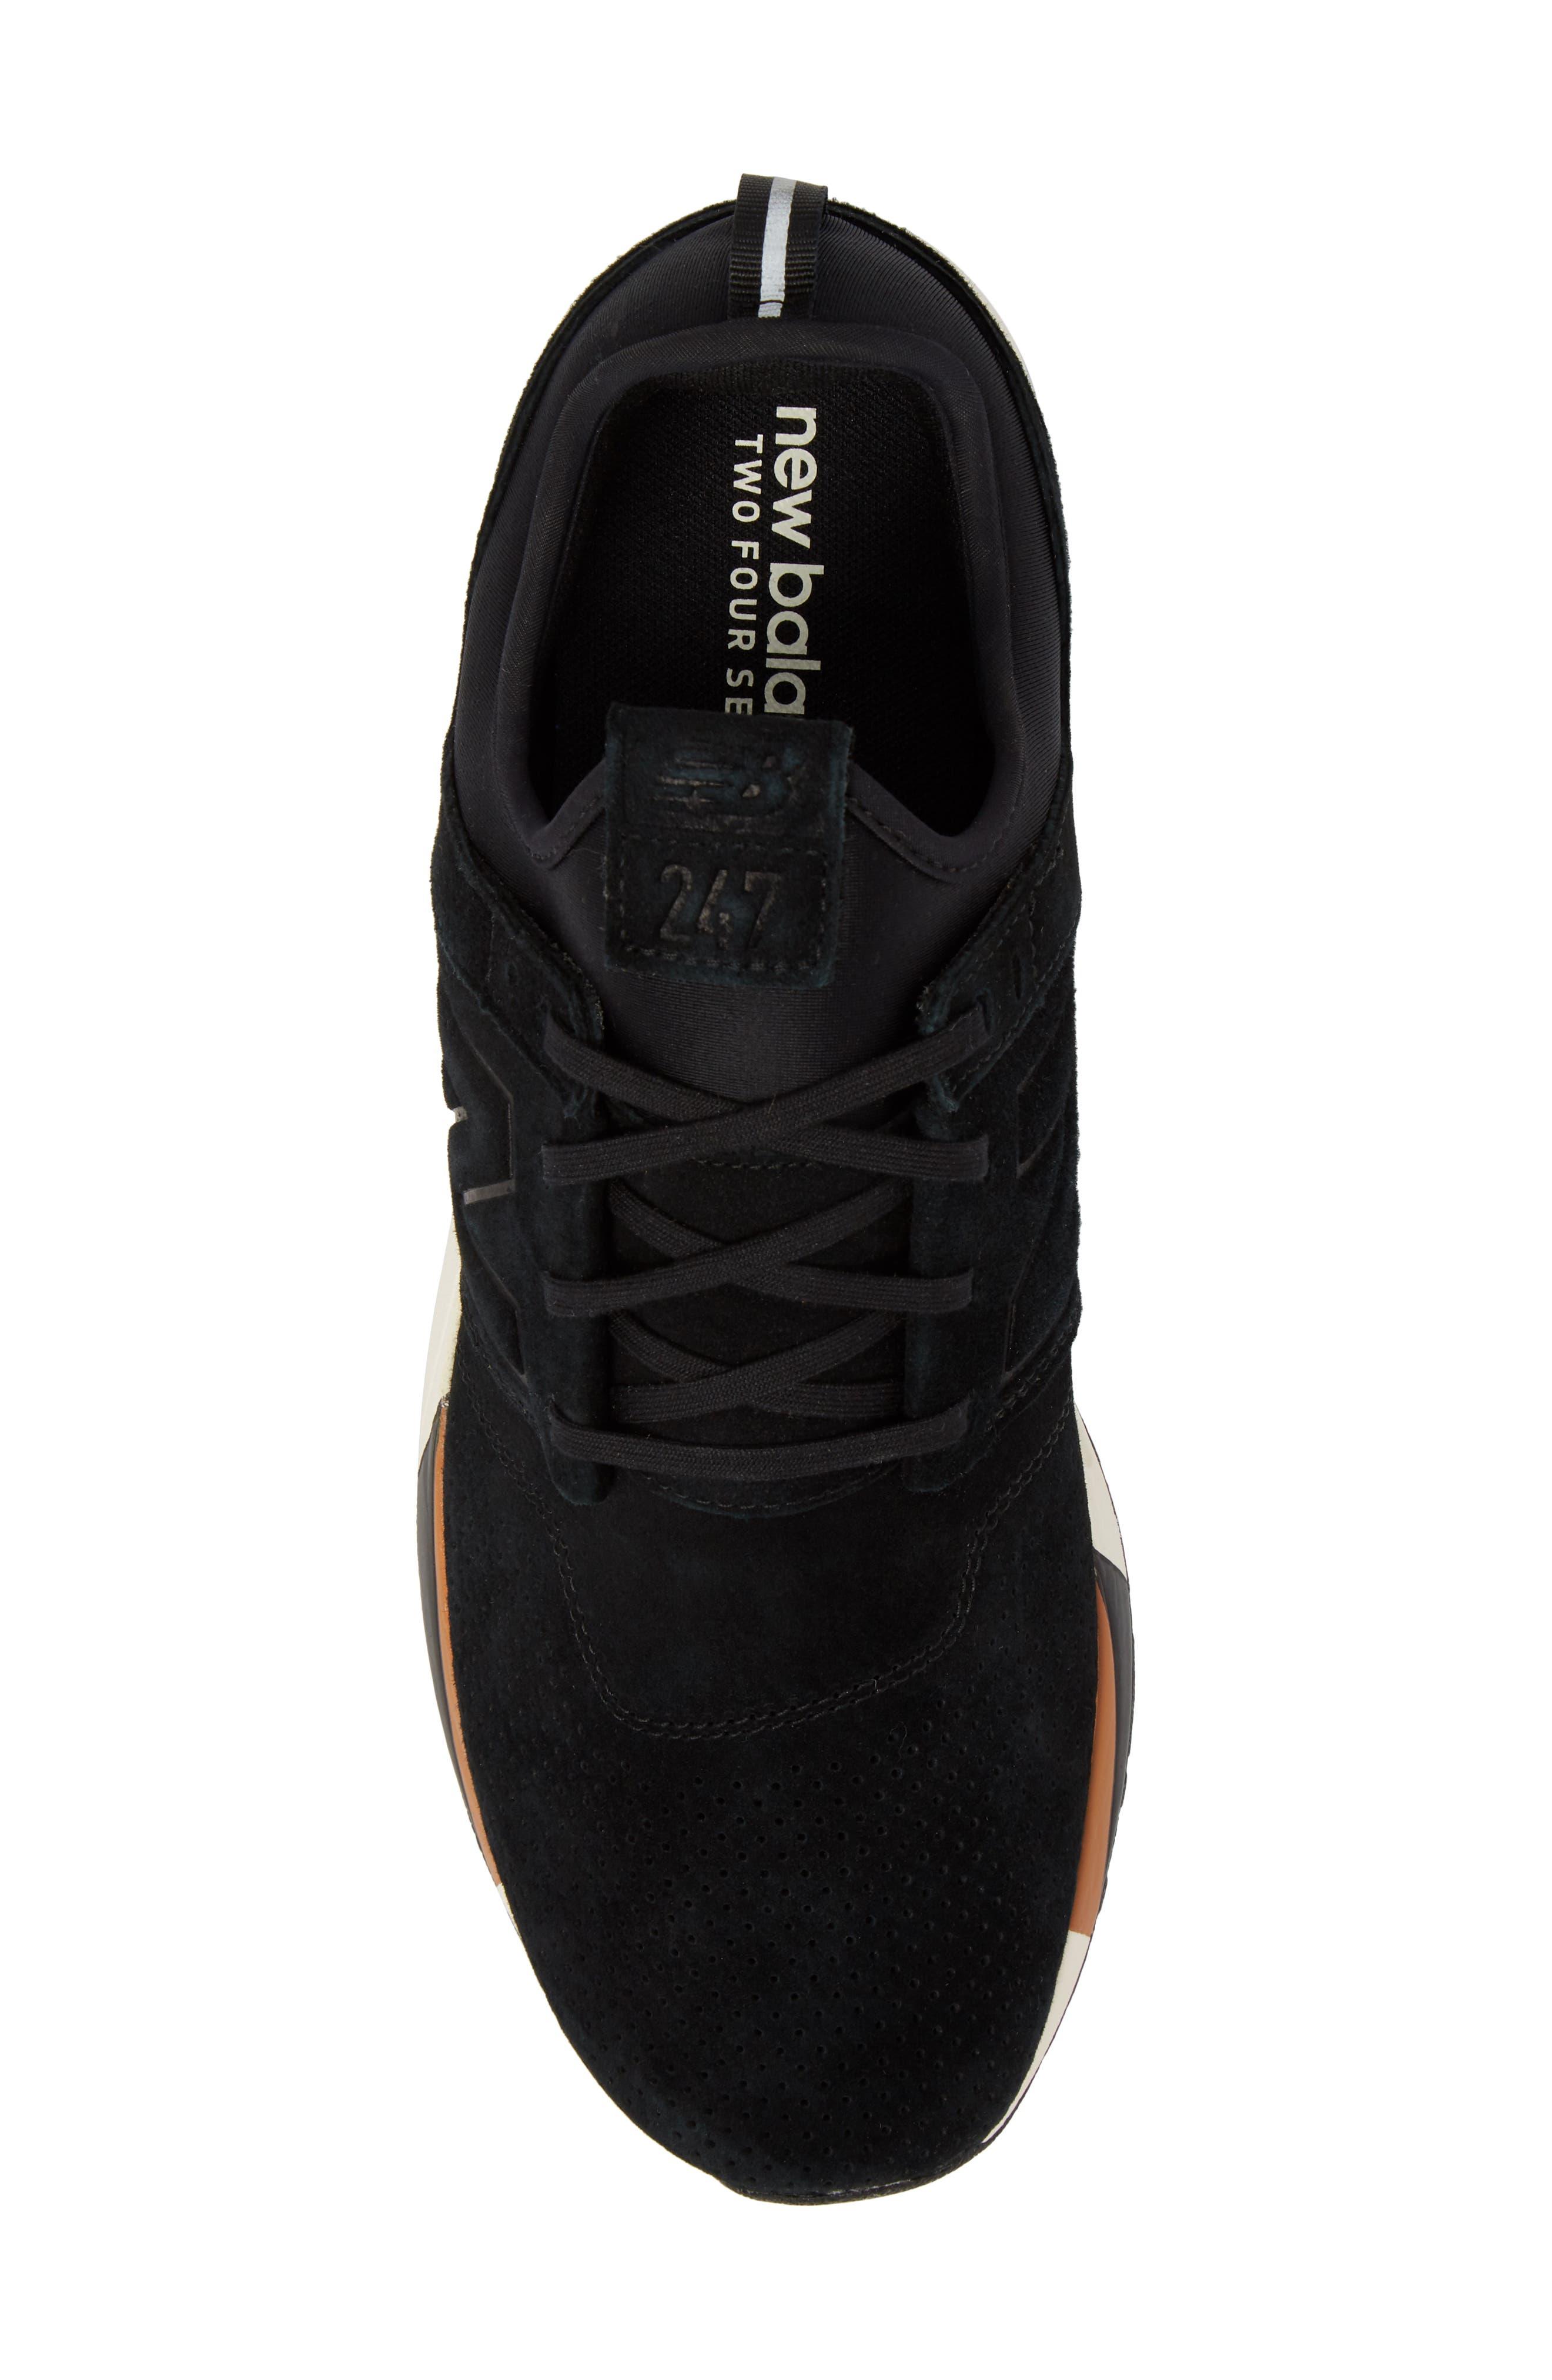 247 Luxe Sneaker,                             Alternate thumbnail 5, color,                             Black